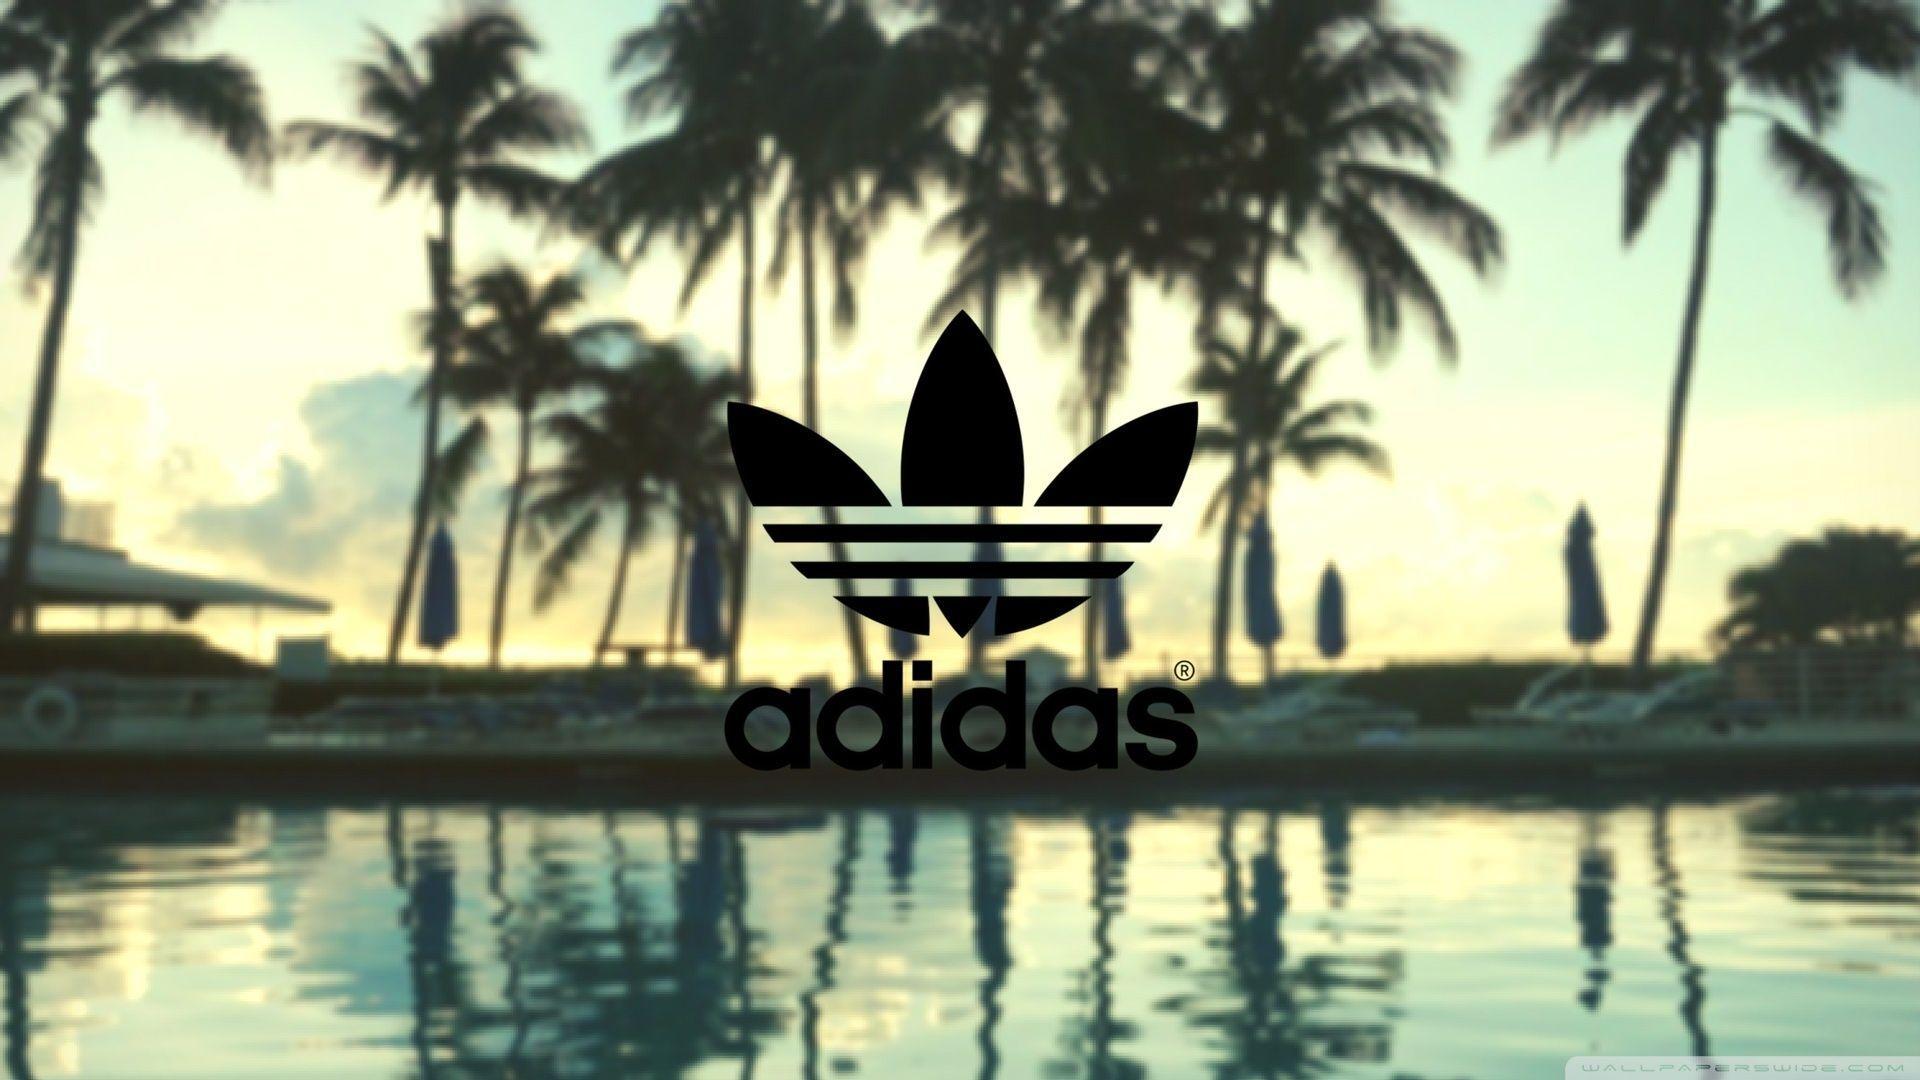 Adidas Computer Wallpapers - Top Free Adidas Computer ...